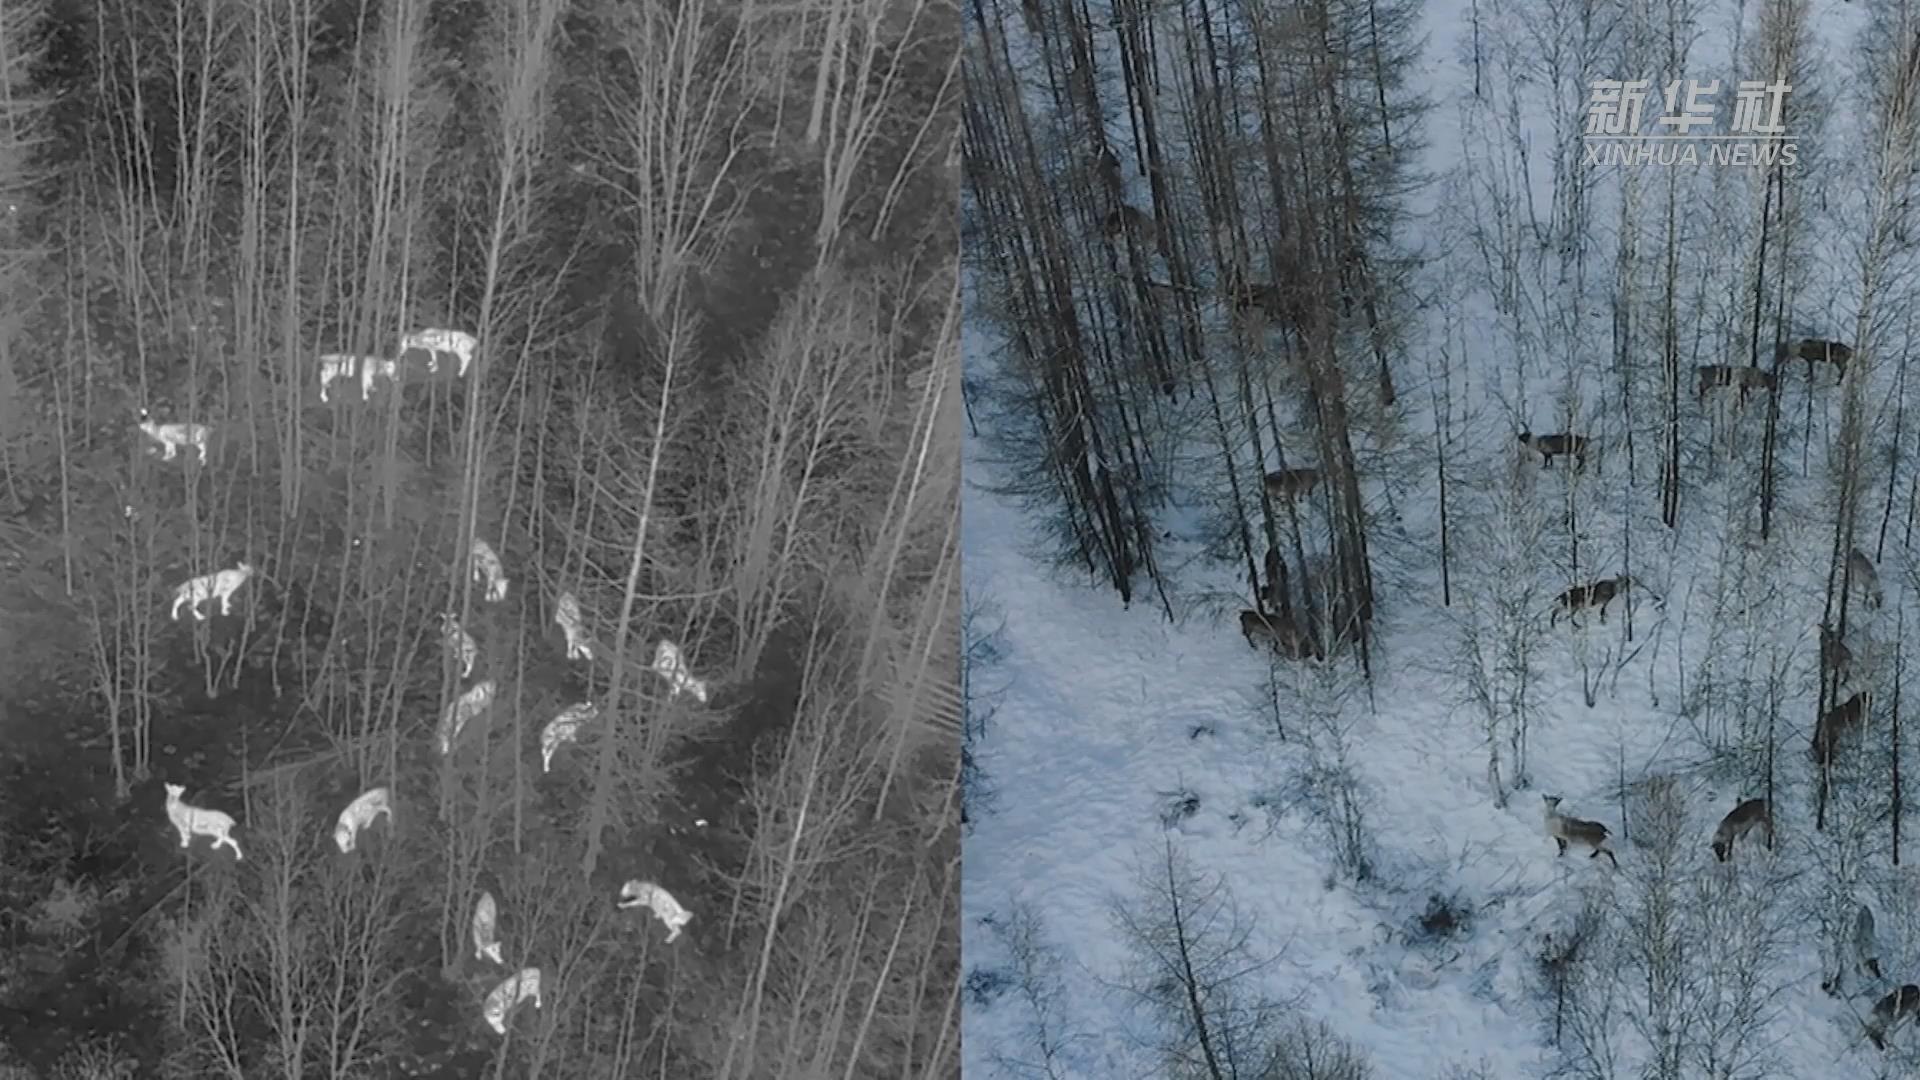 無人機拍到野生動物